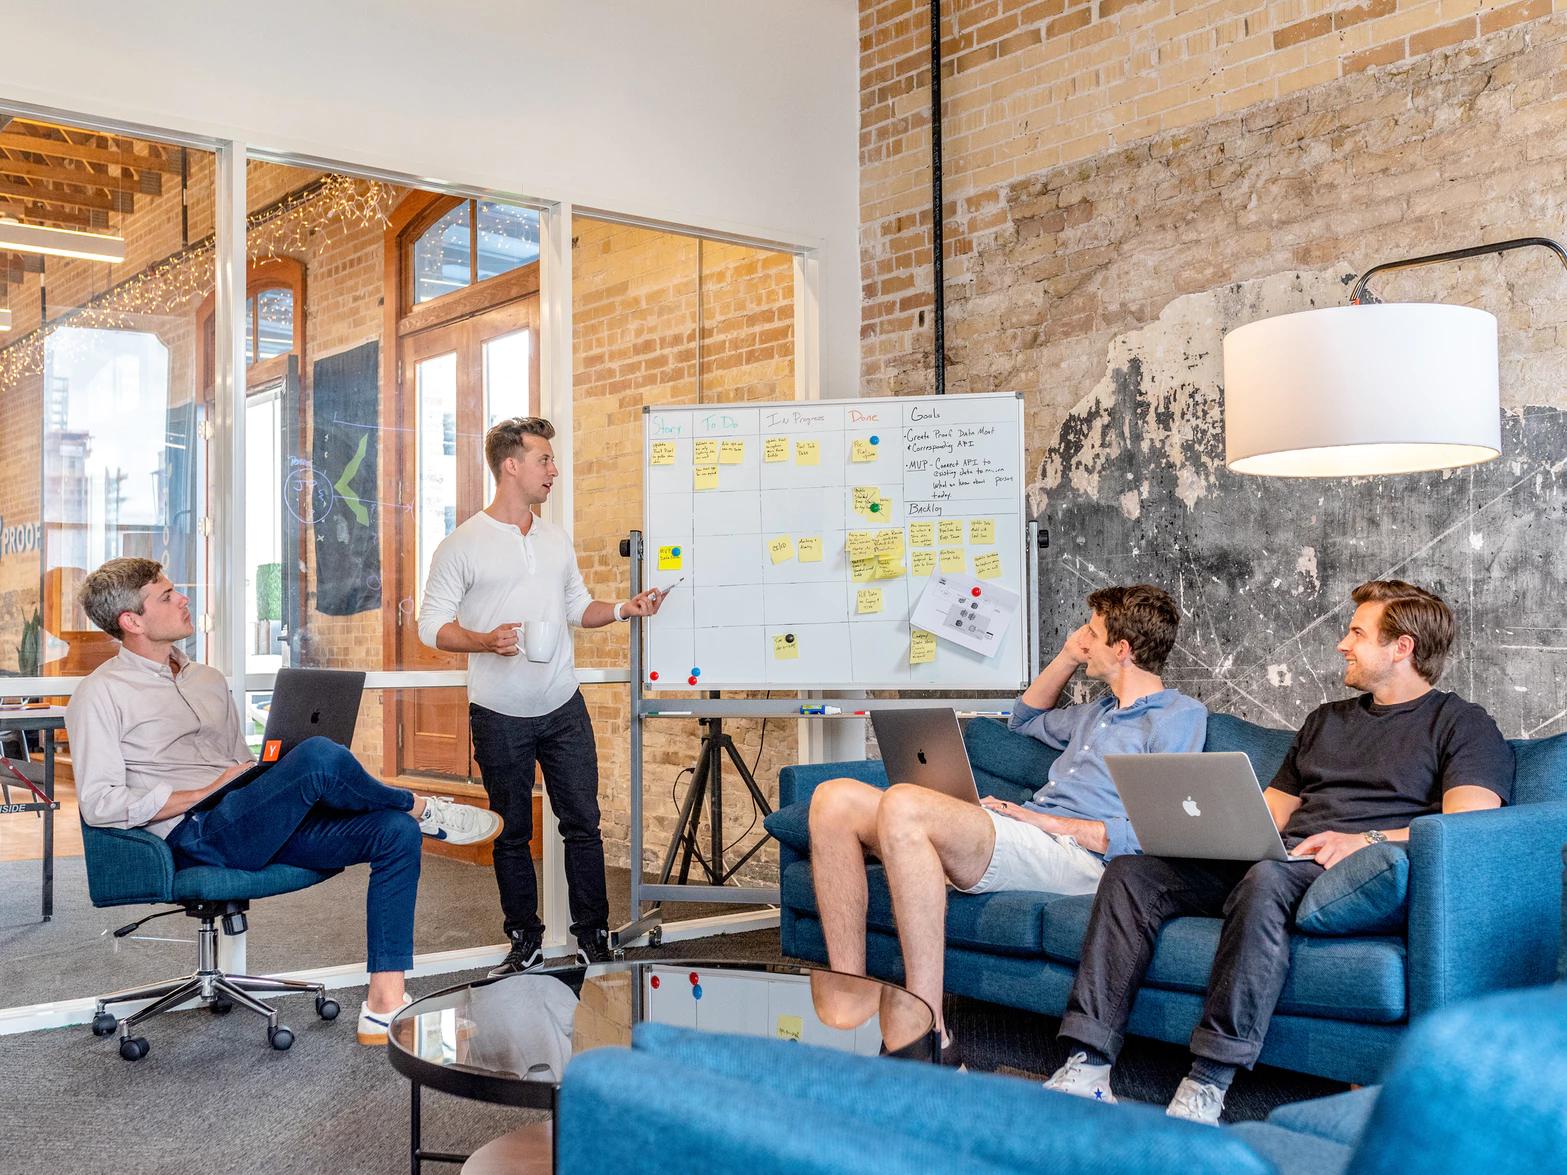 group of men working meeting